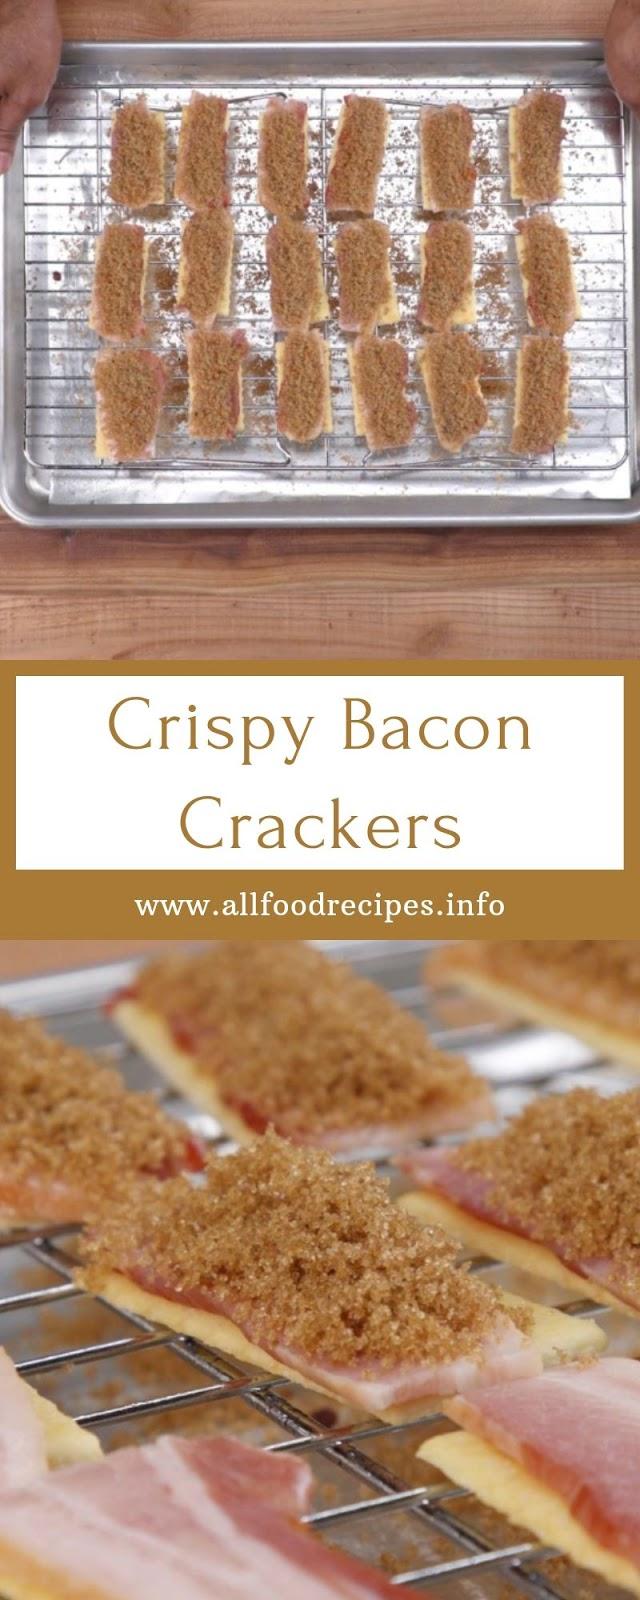 Crispy Bacon Crackers